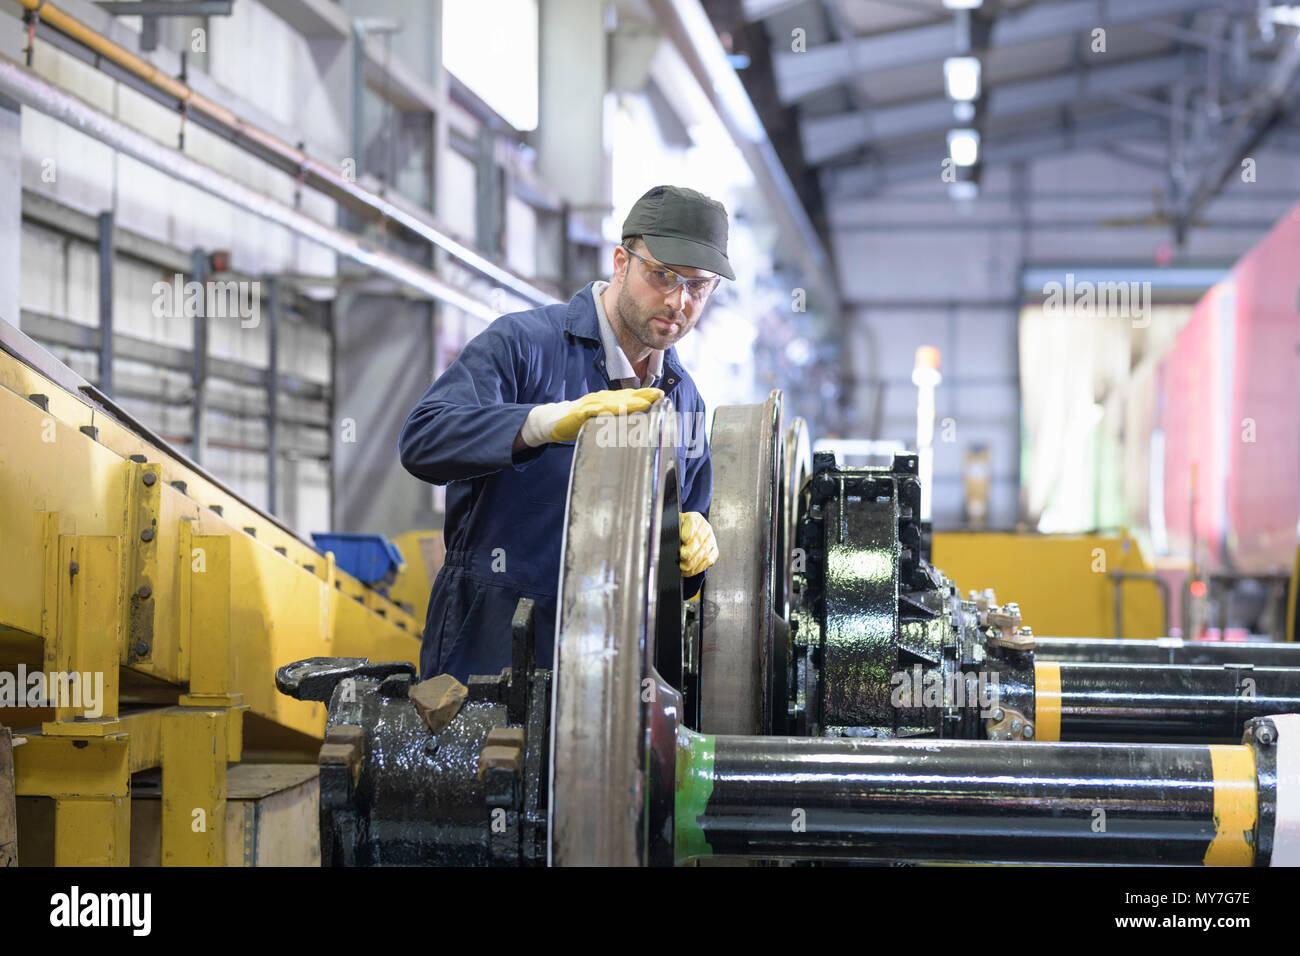 Engineer inspecting locomotive wheels for wear in train engineering factory - Stock Image